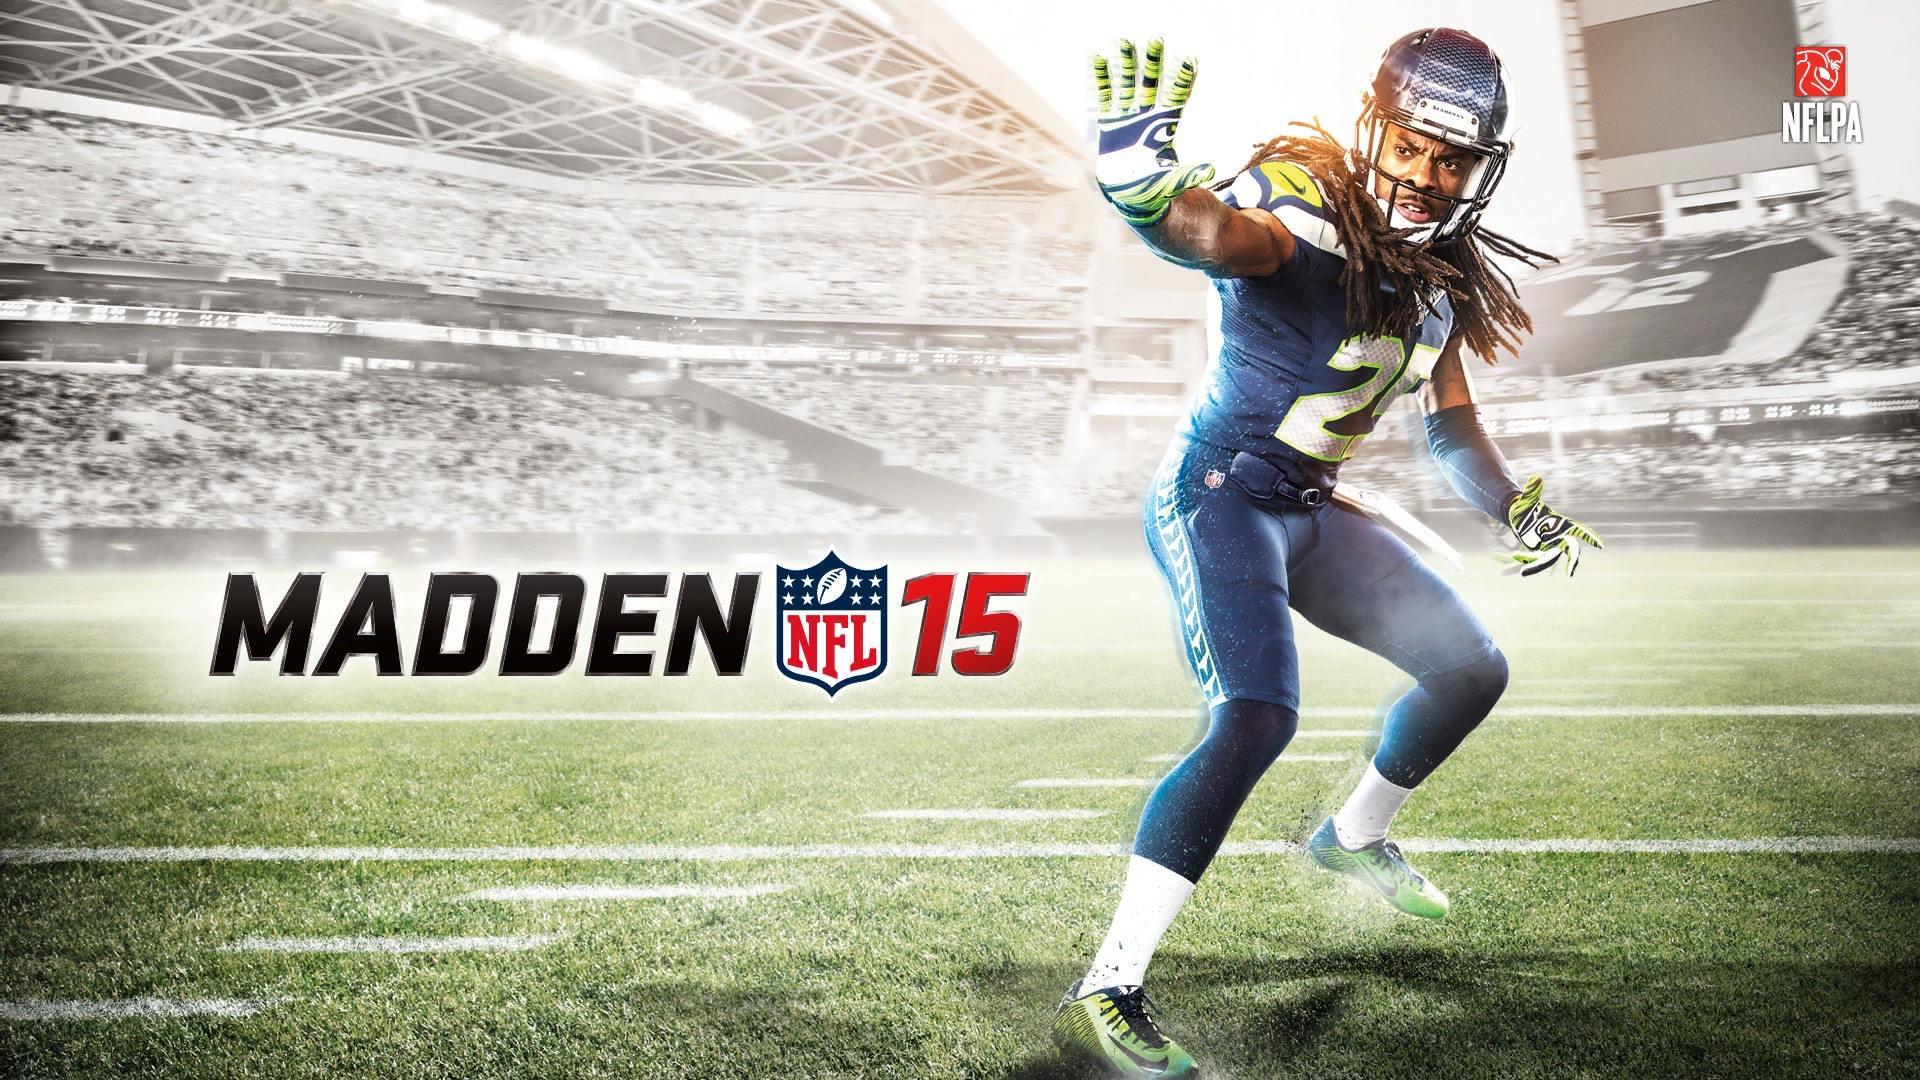 Richard Sherman Seattle Seahawks Madden NFL 2015 Game Cover Wallpaper 1920x1080